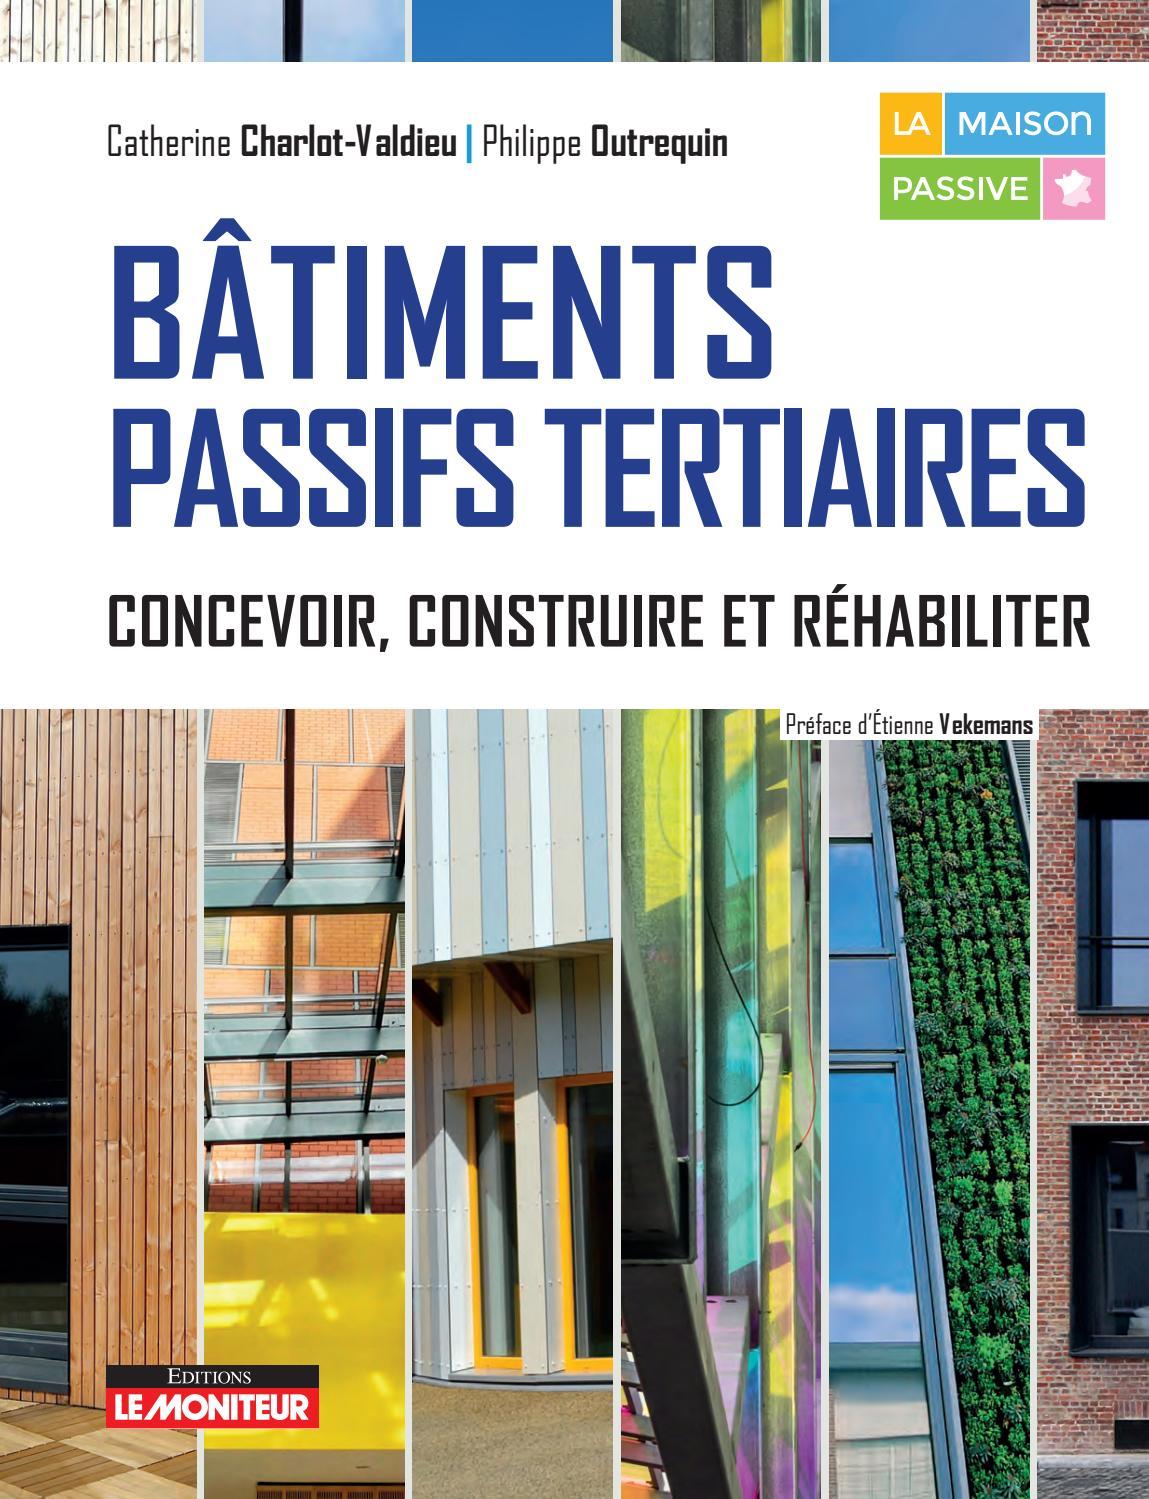 Passifs Issuu Digital Tertiaires By Infopro Bâtiments mgYbyIf7v6